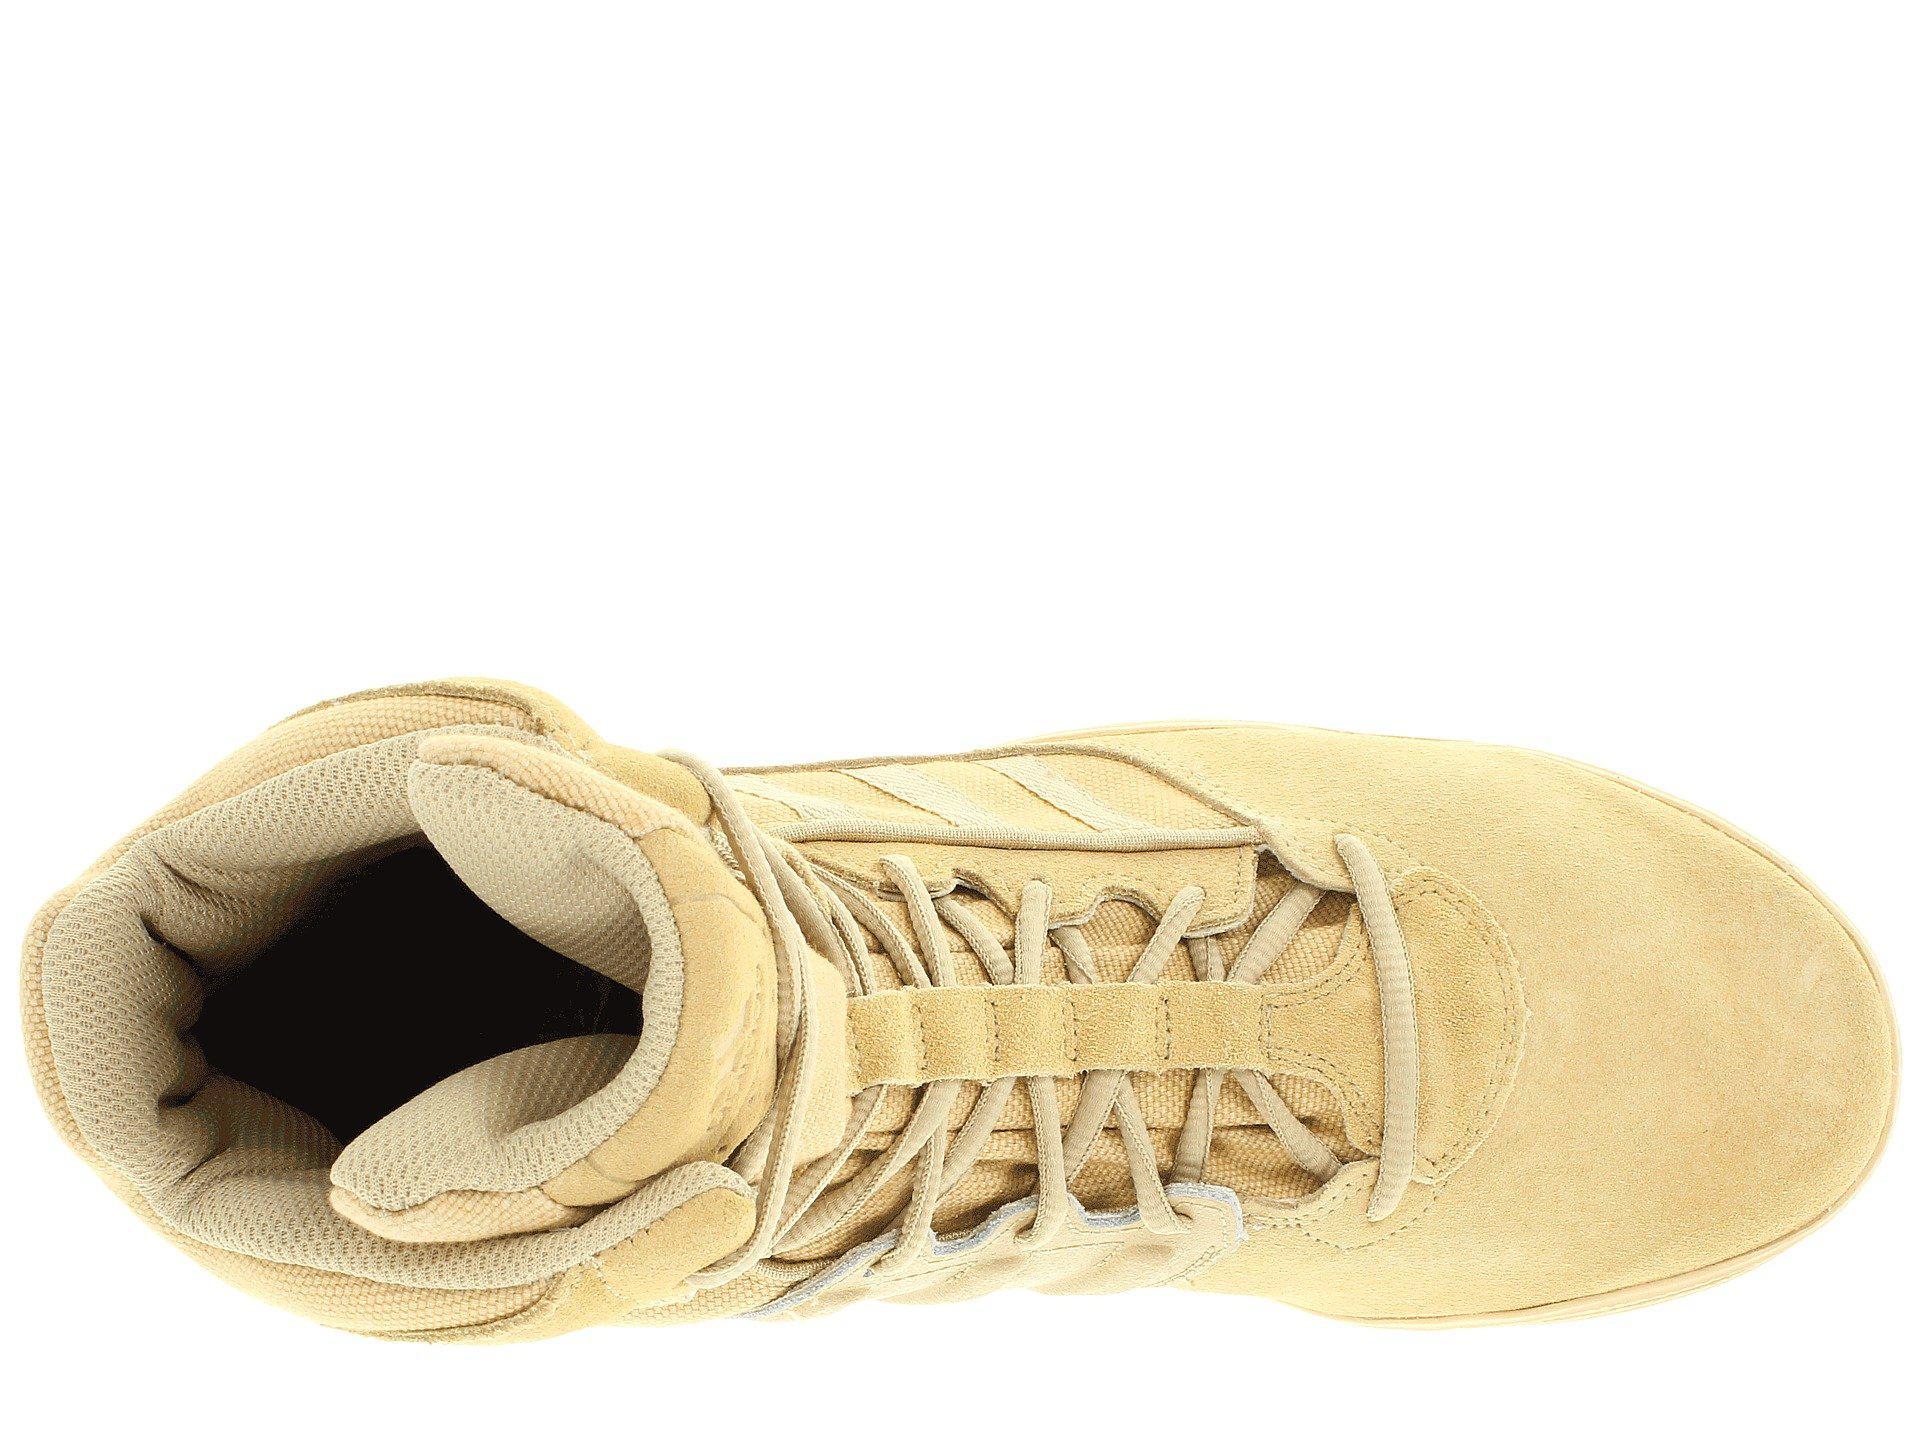 lyst adidas gsg (tempesta di sabbia), scarpe da uomo naturale